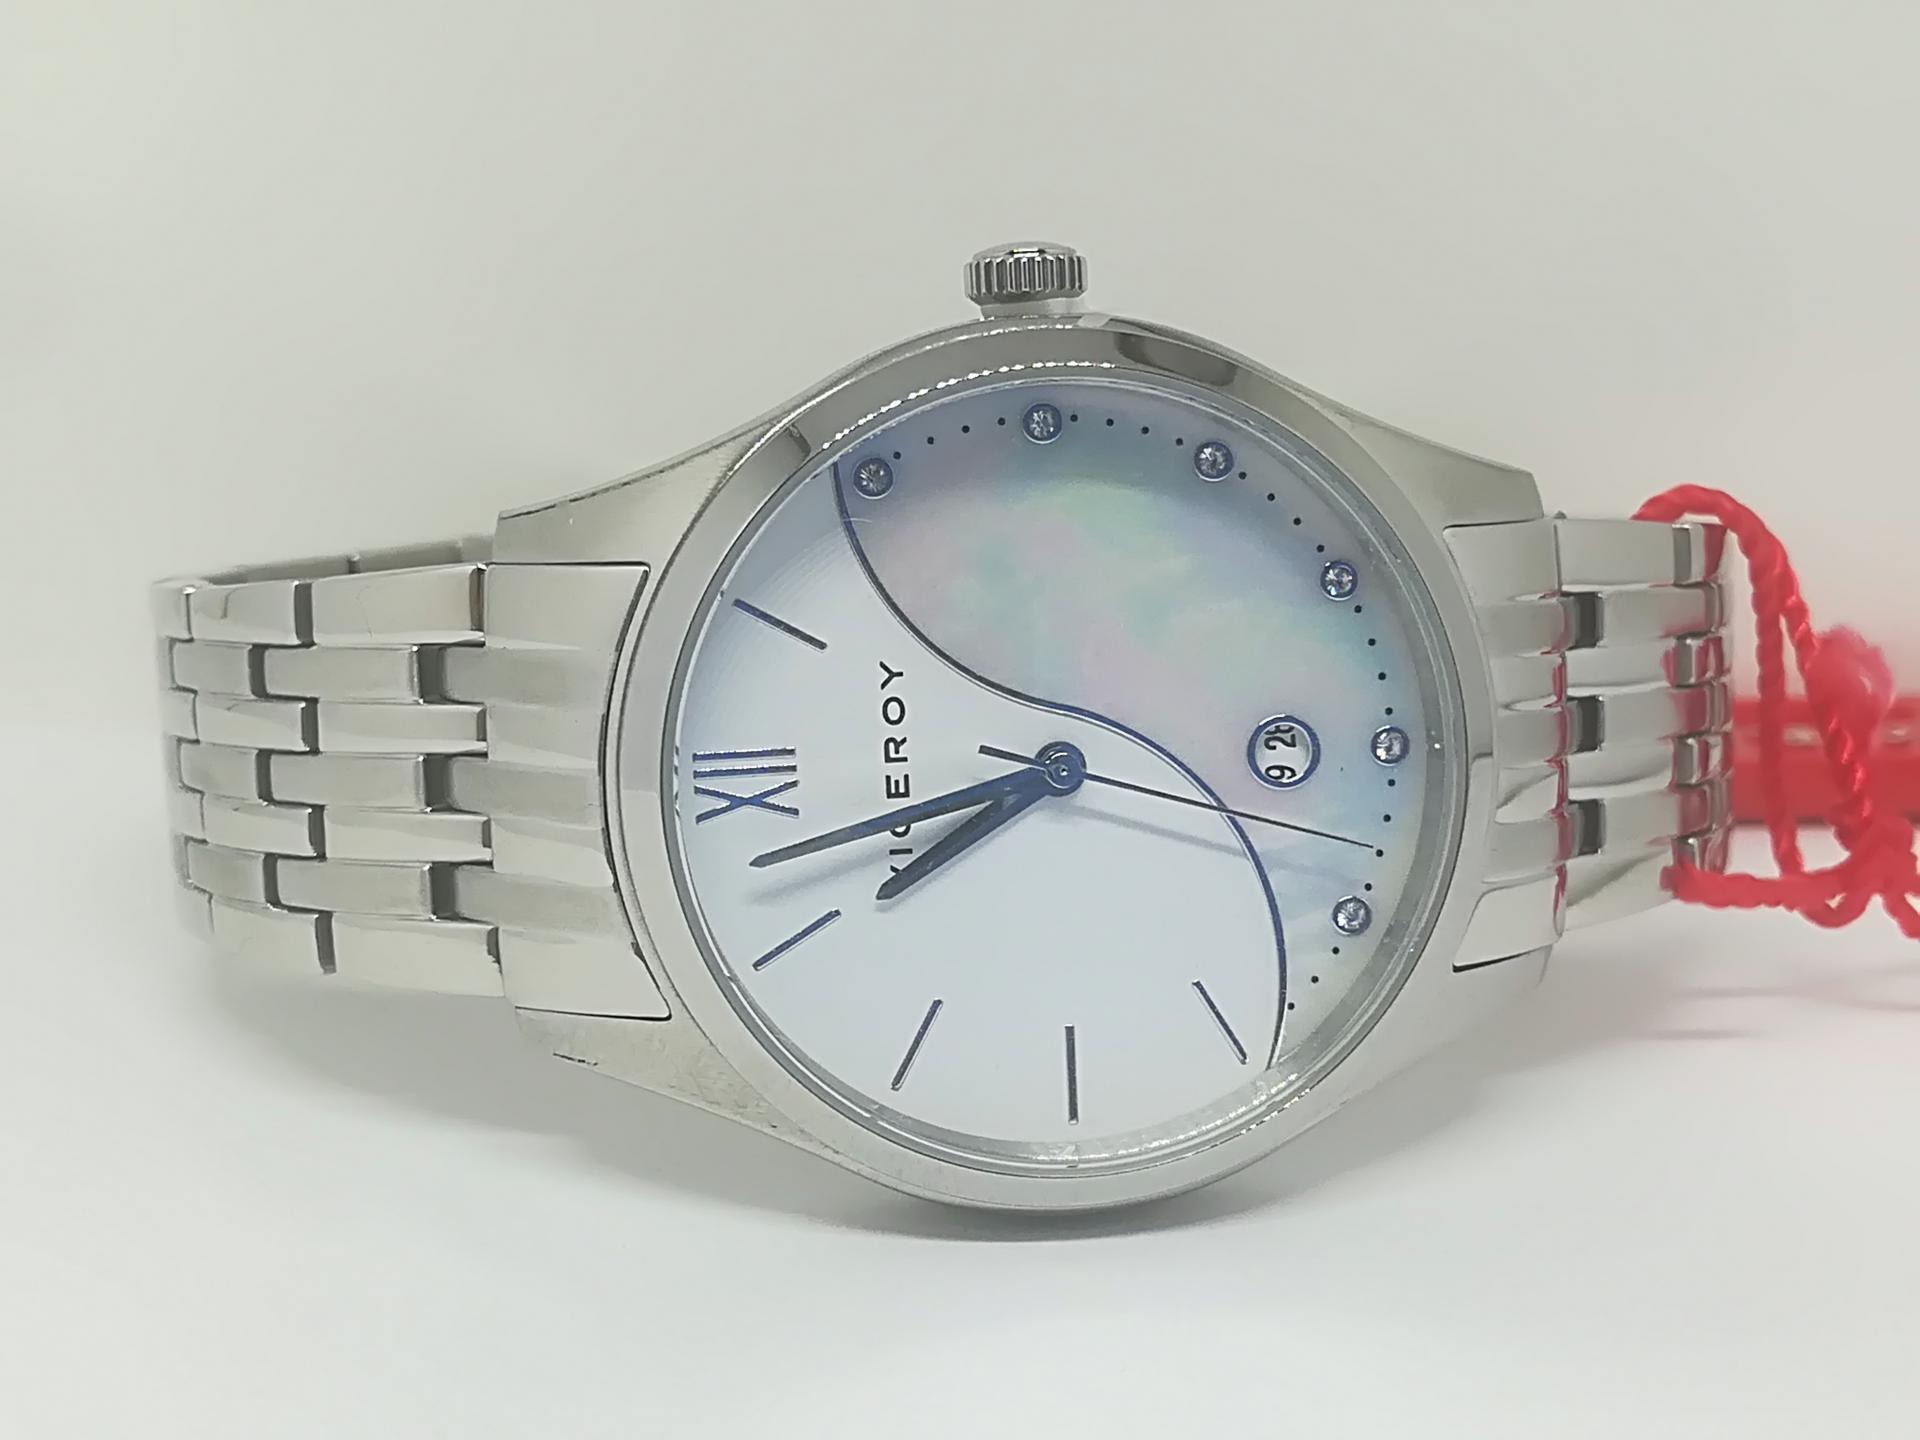 Reloj Viceroy Mujer Acero Esfera Nacar 471174-03